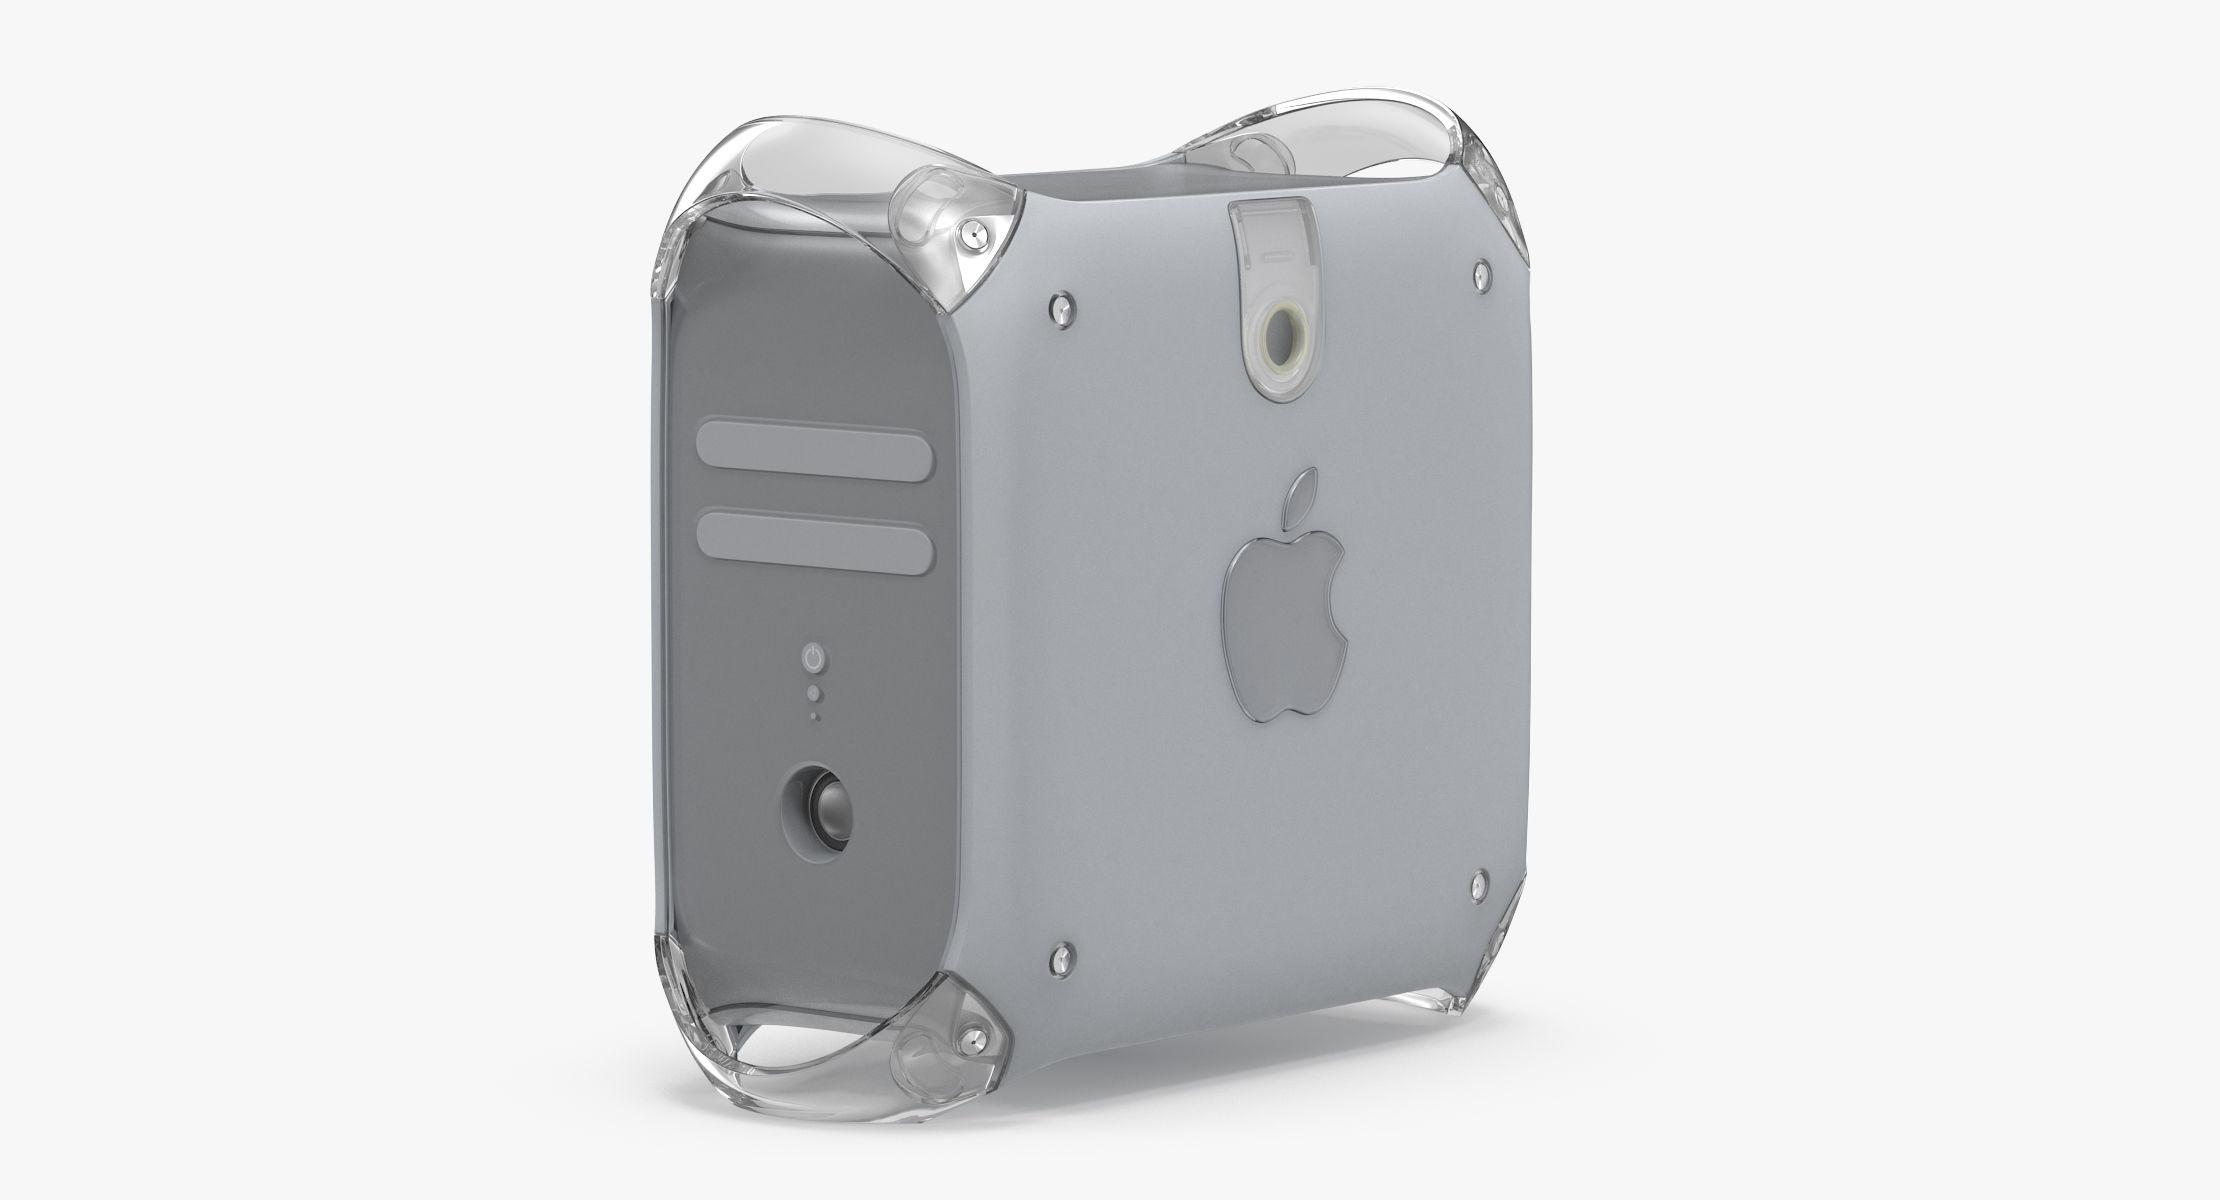 Power Macintosh G4 (Quicksilver) - reel 1